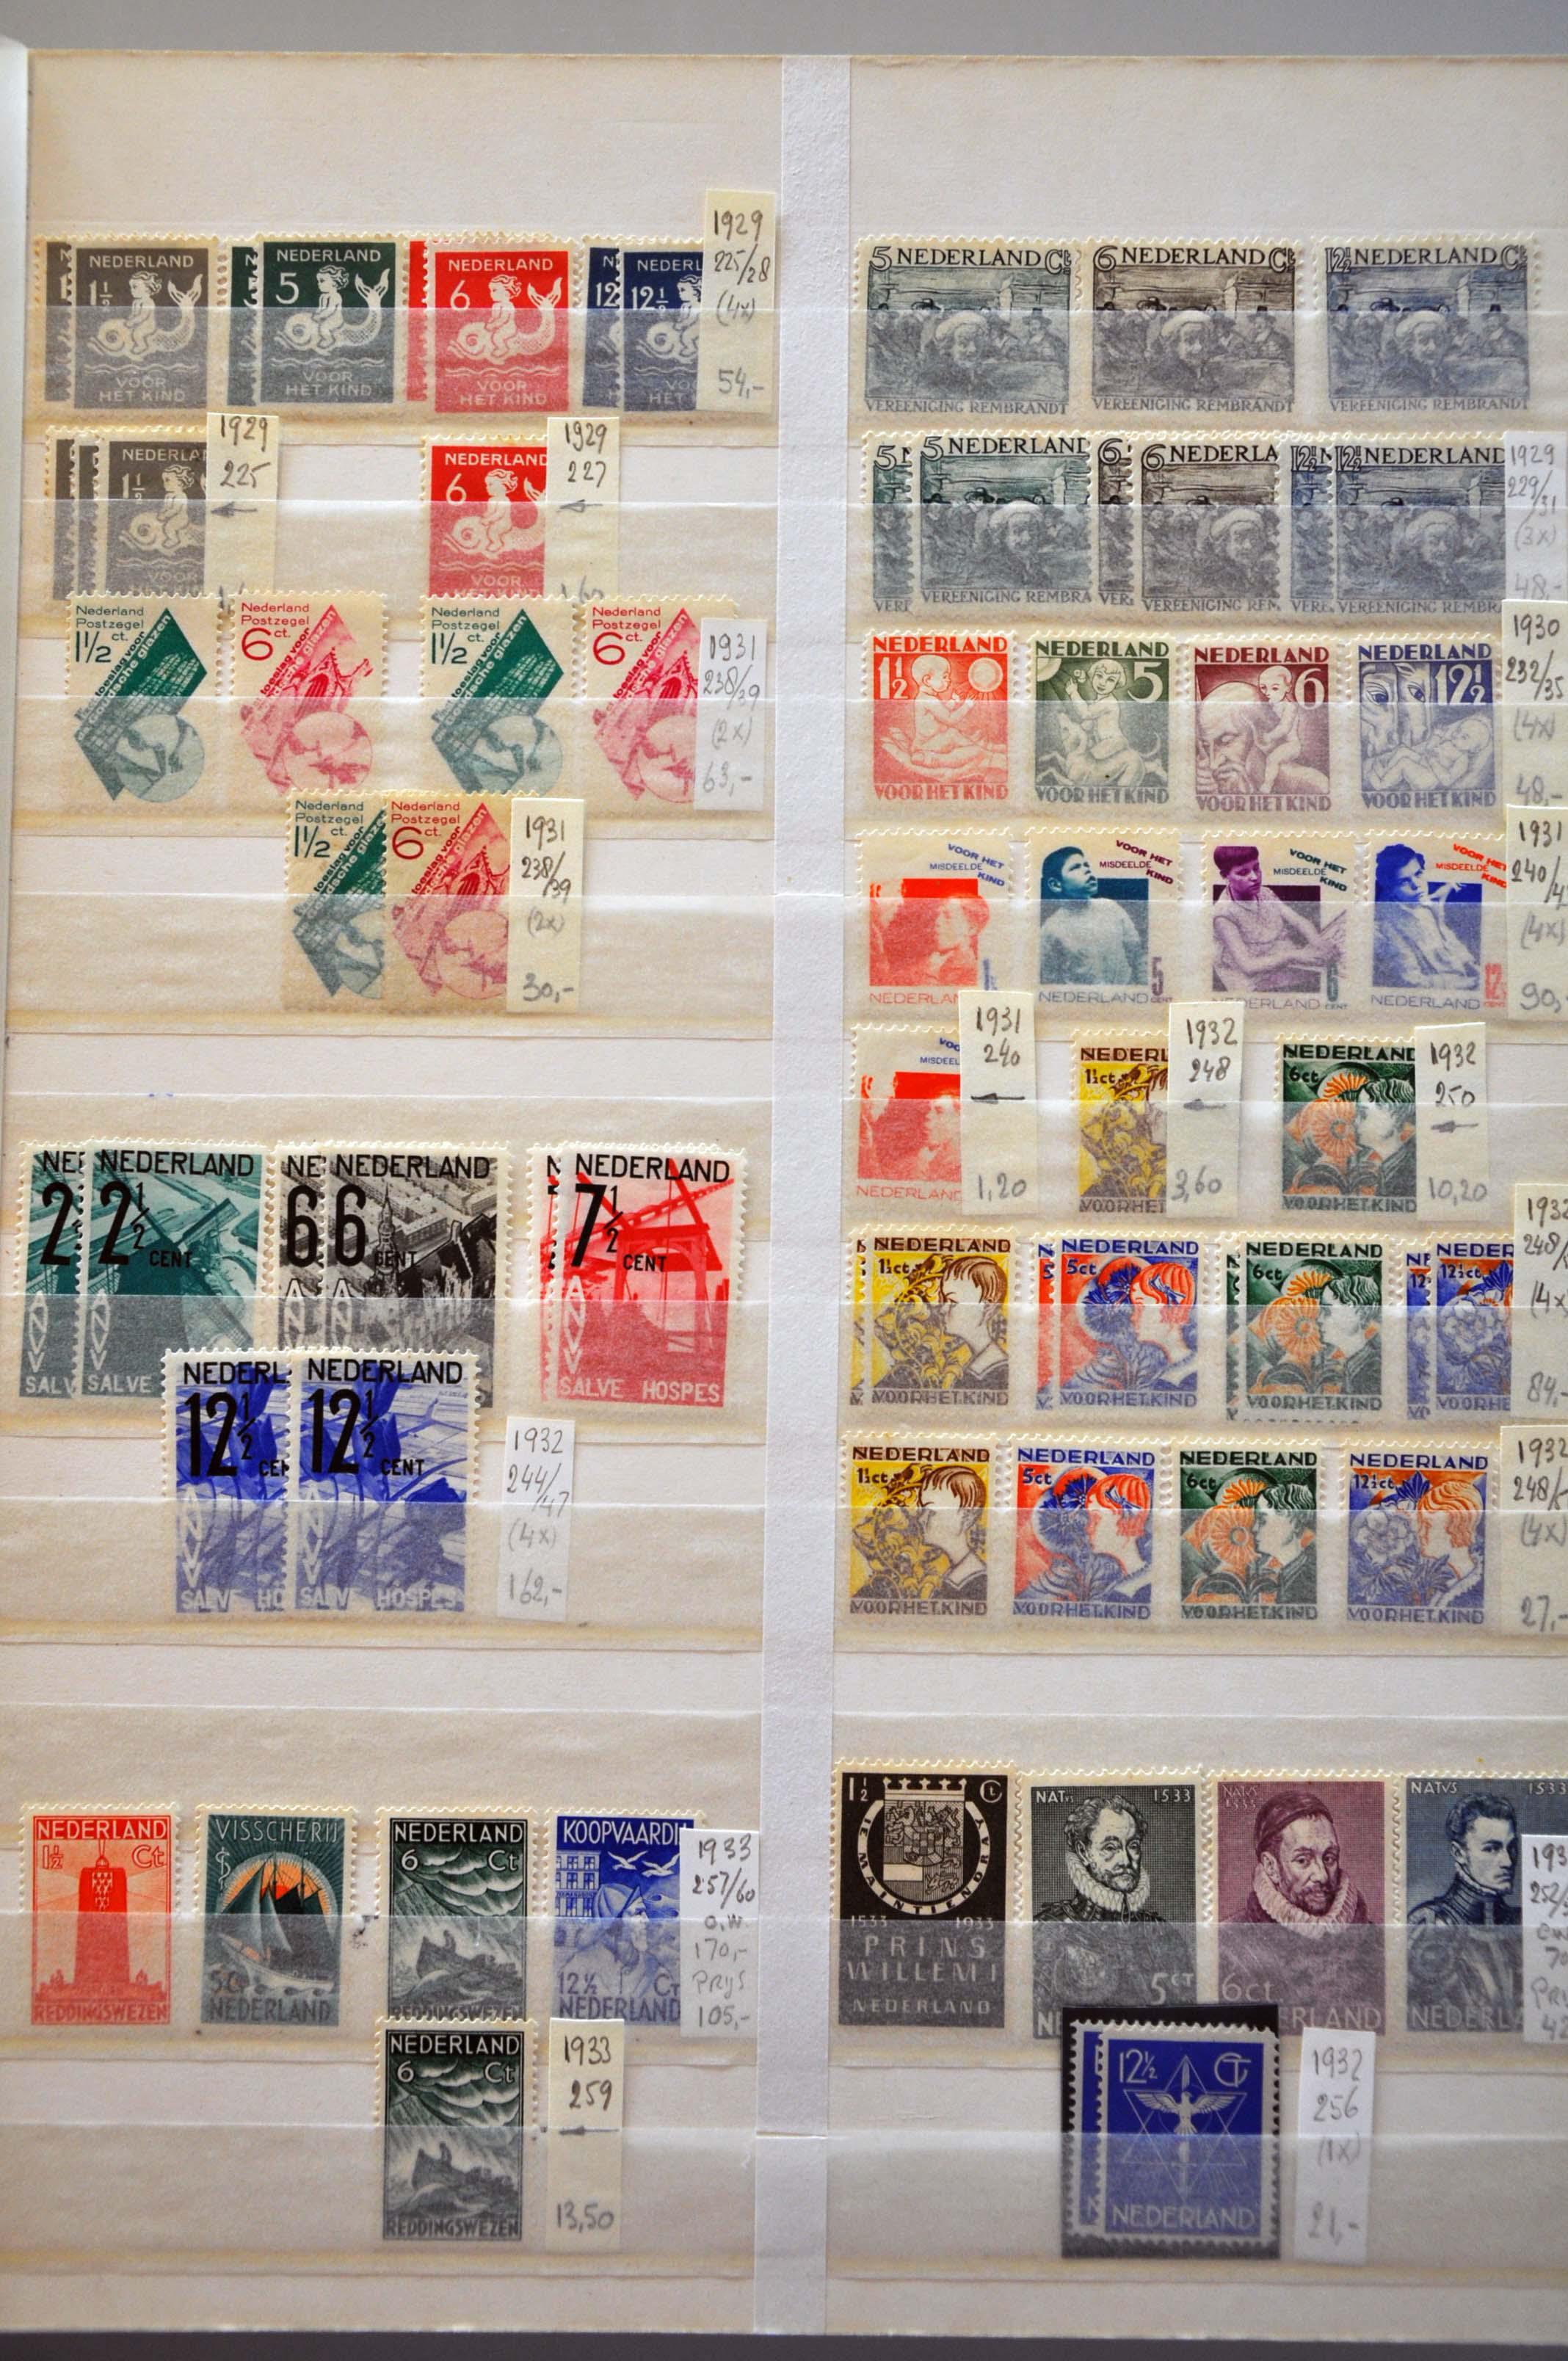 Lot 1720 - Netherlands and former colonies Netherlands -  Corinphila Veilingen Auction 242: General sale